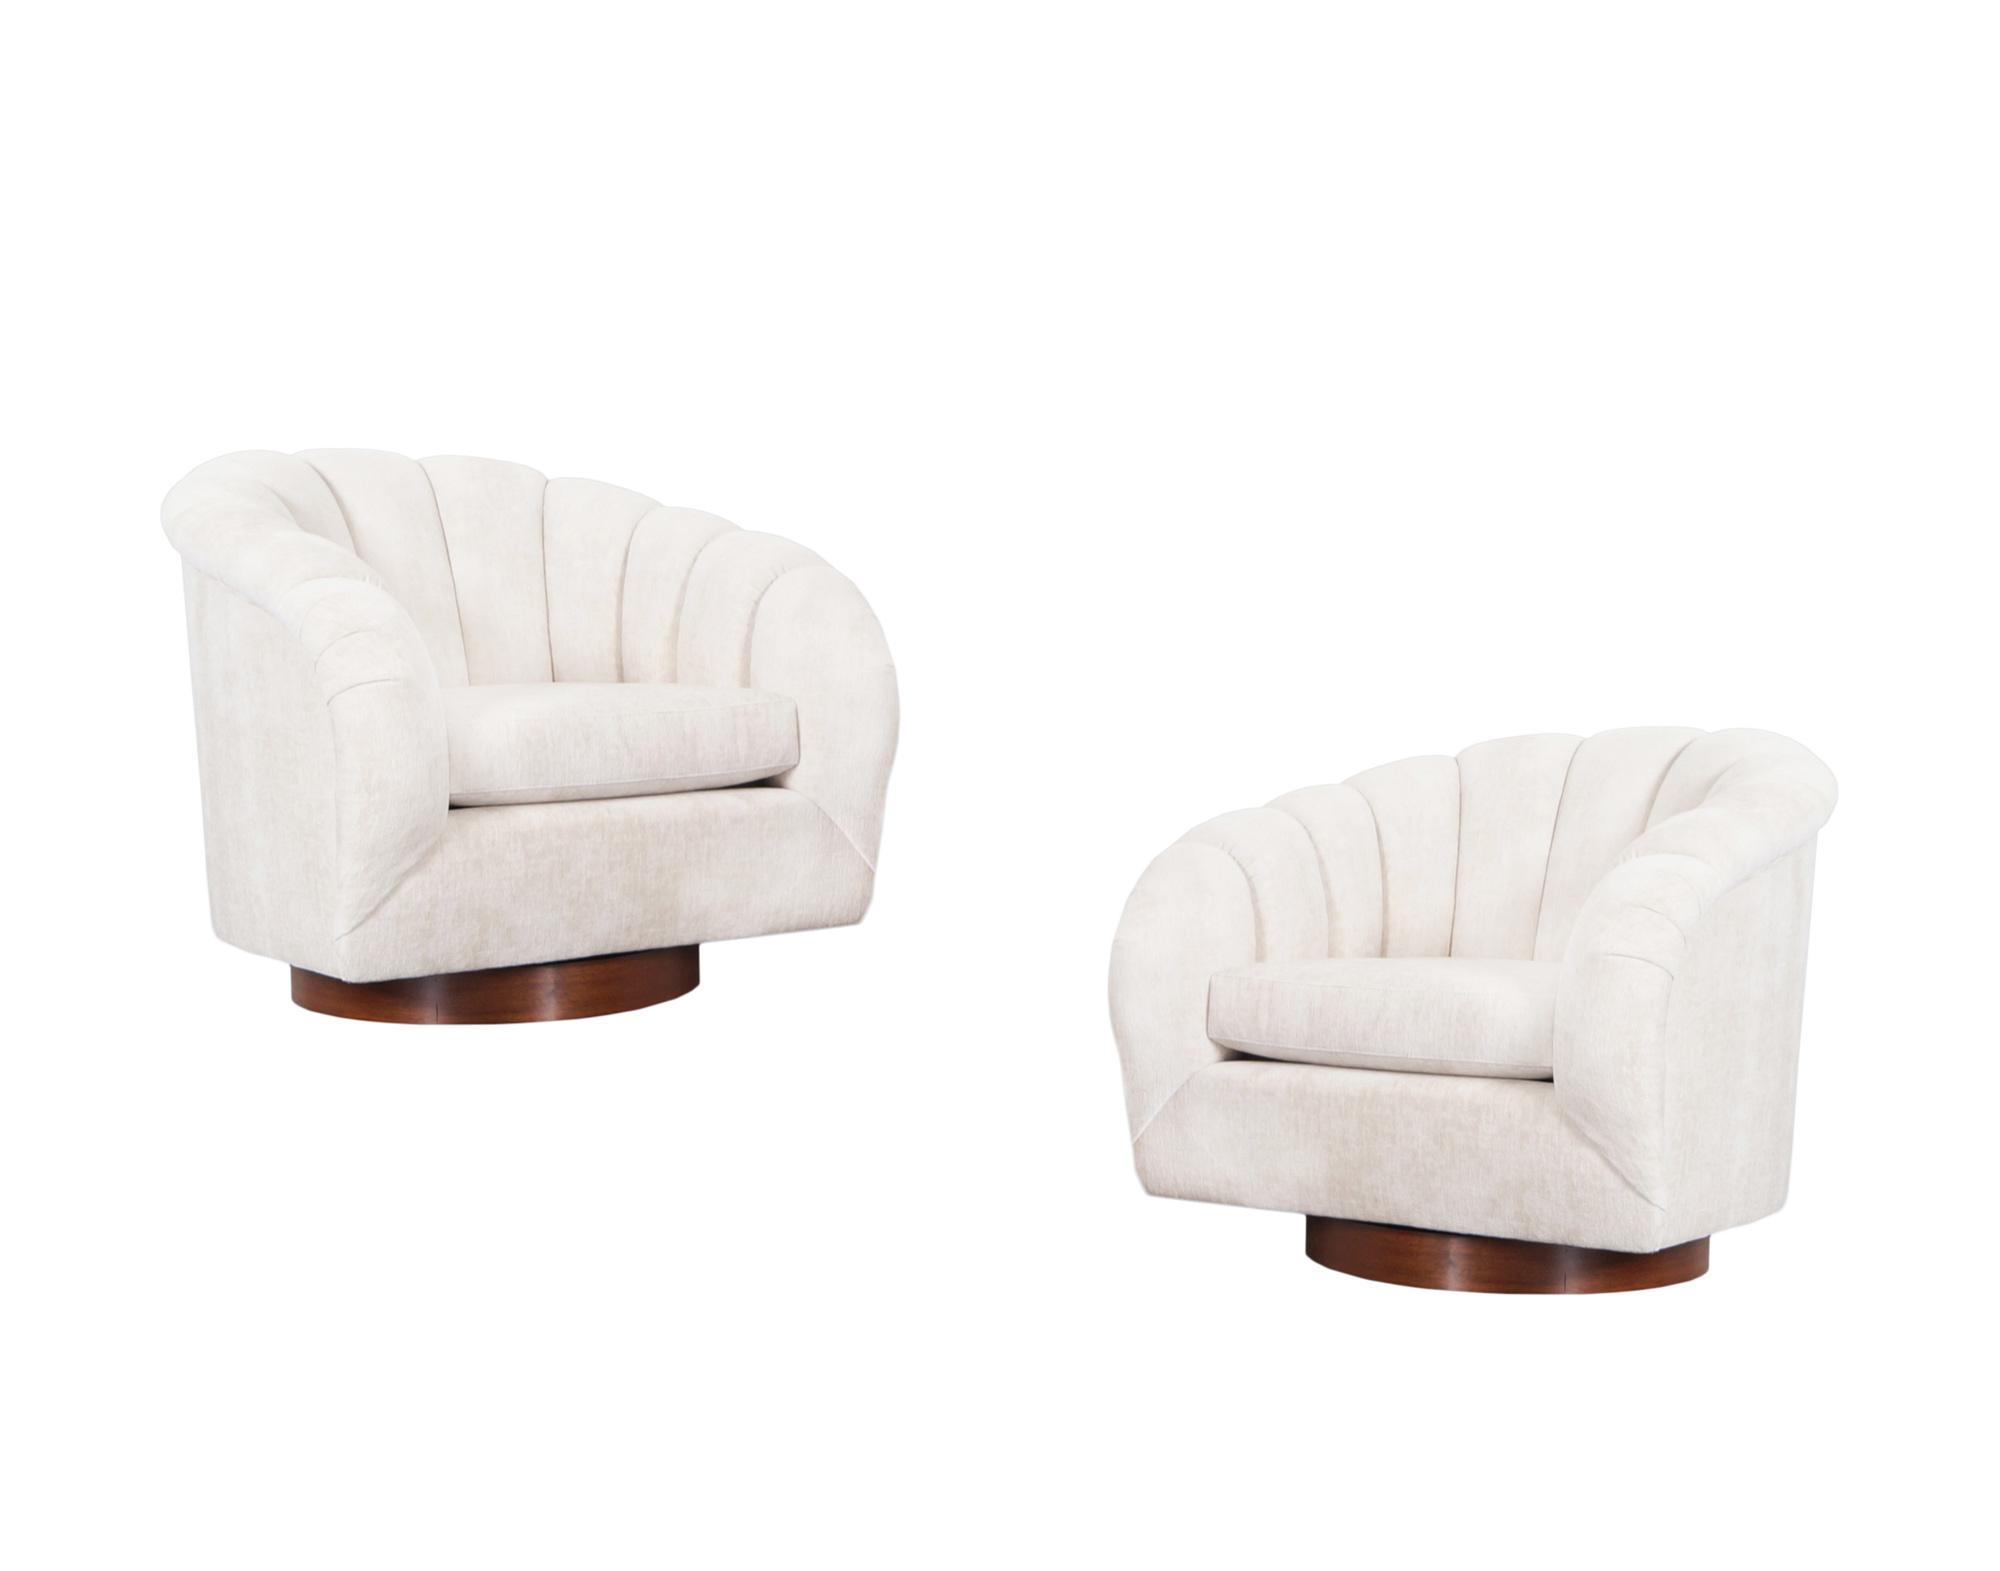 Vintage Walnut Channel Back Swivel Lounge Chairs by Milo Baughman